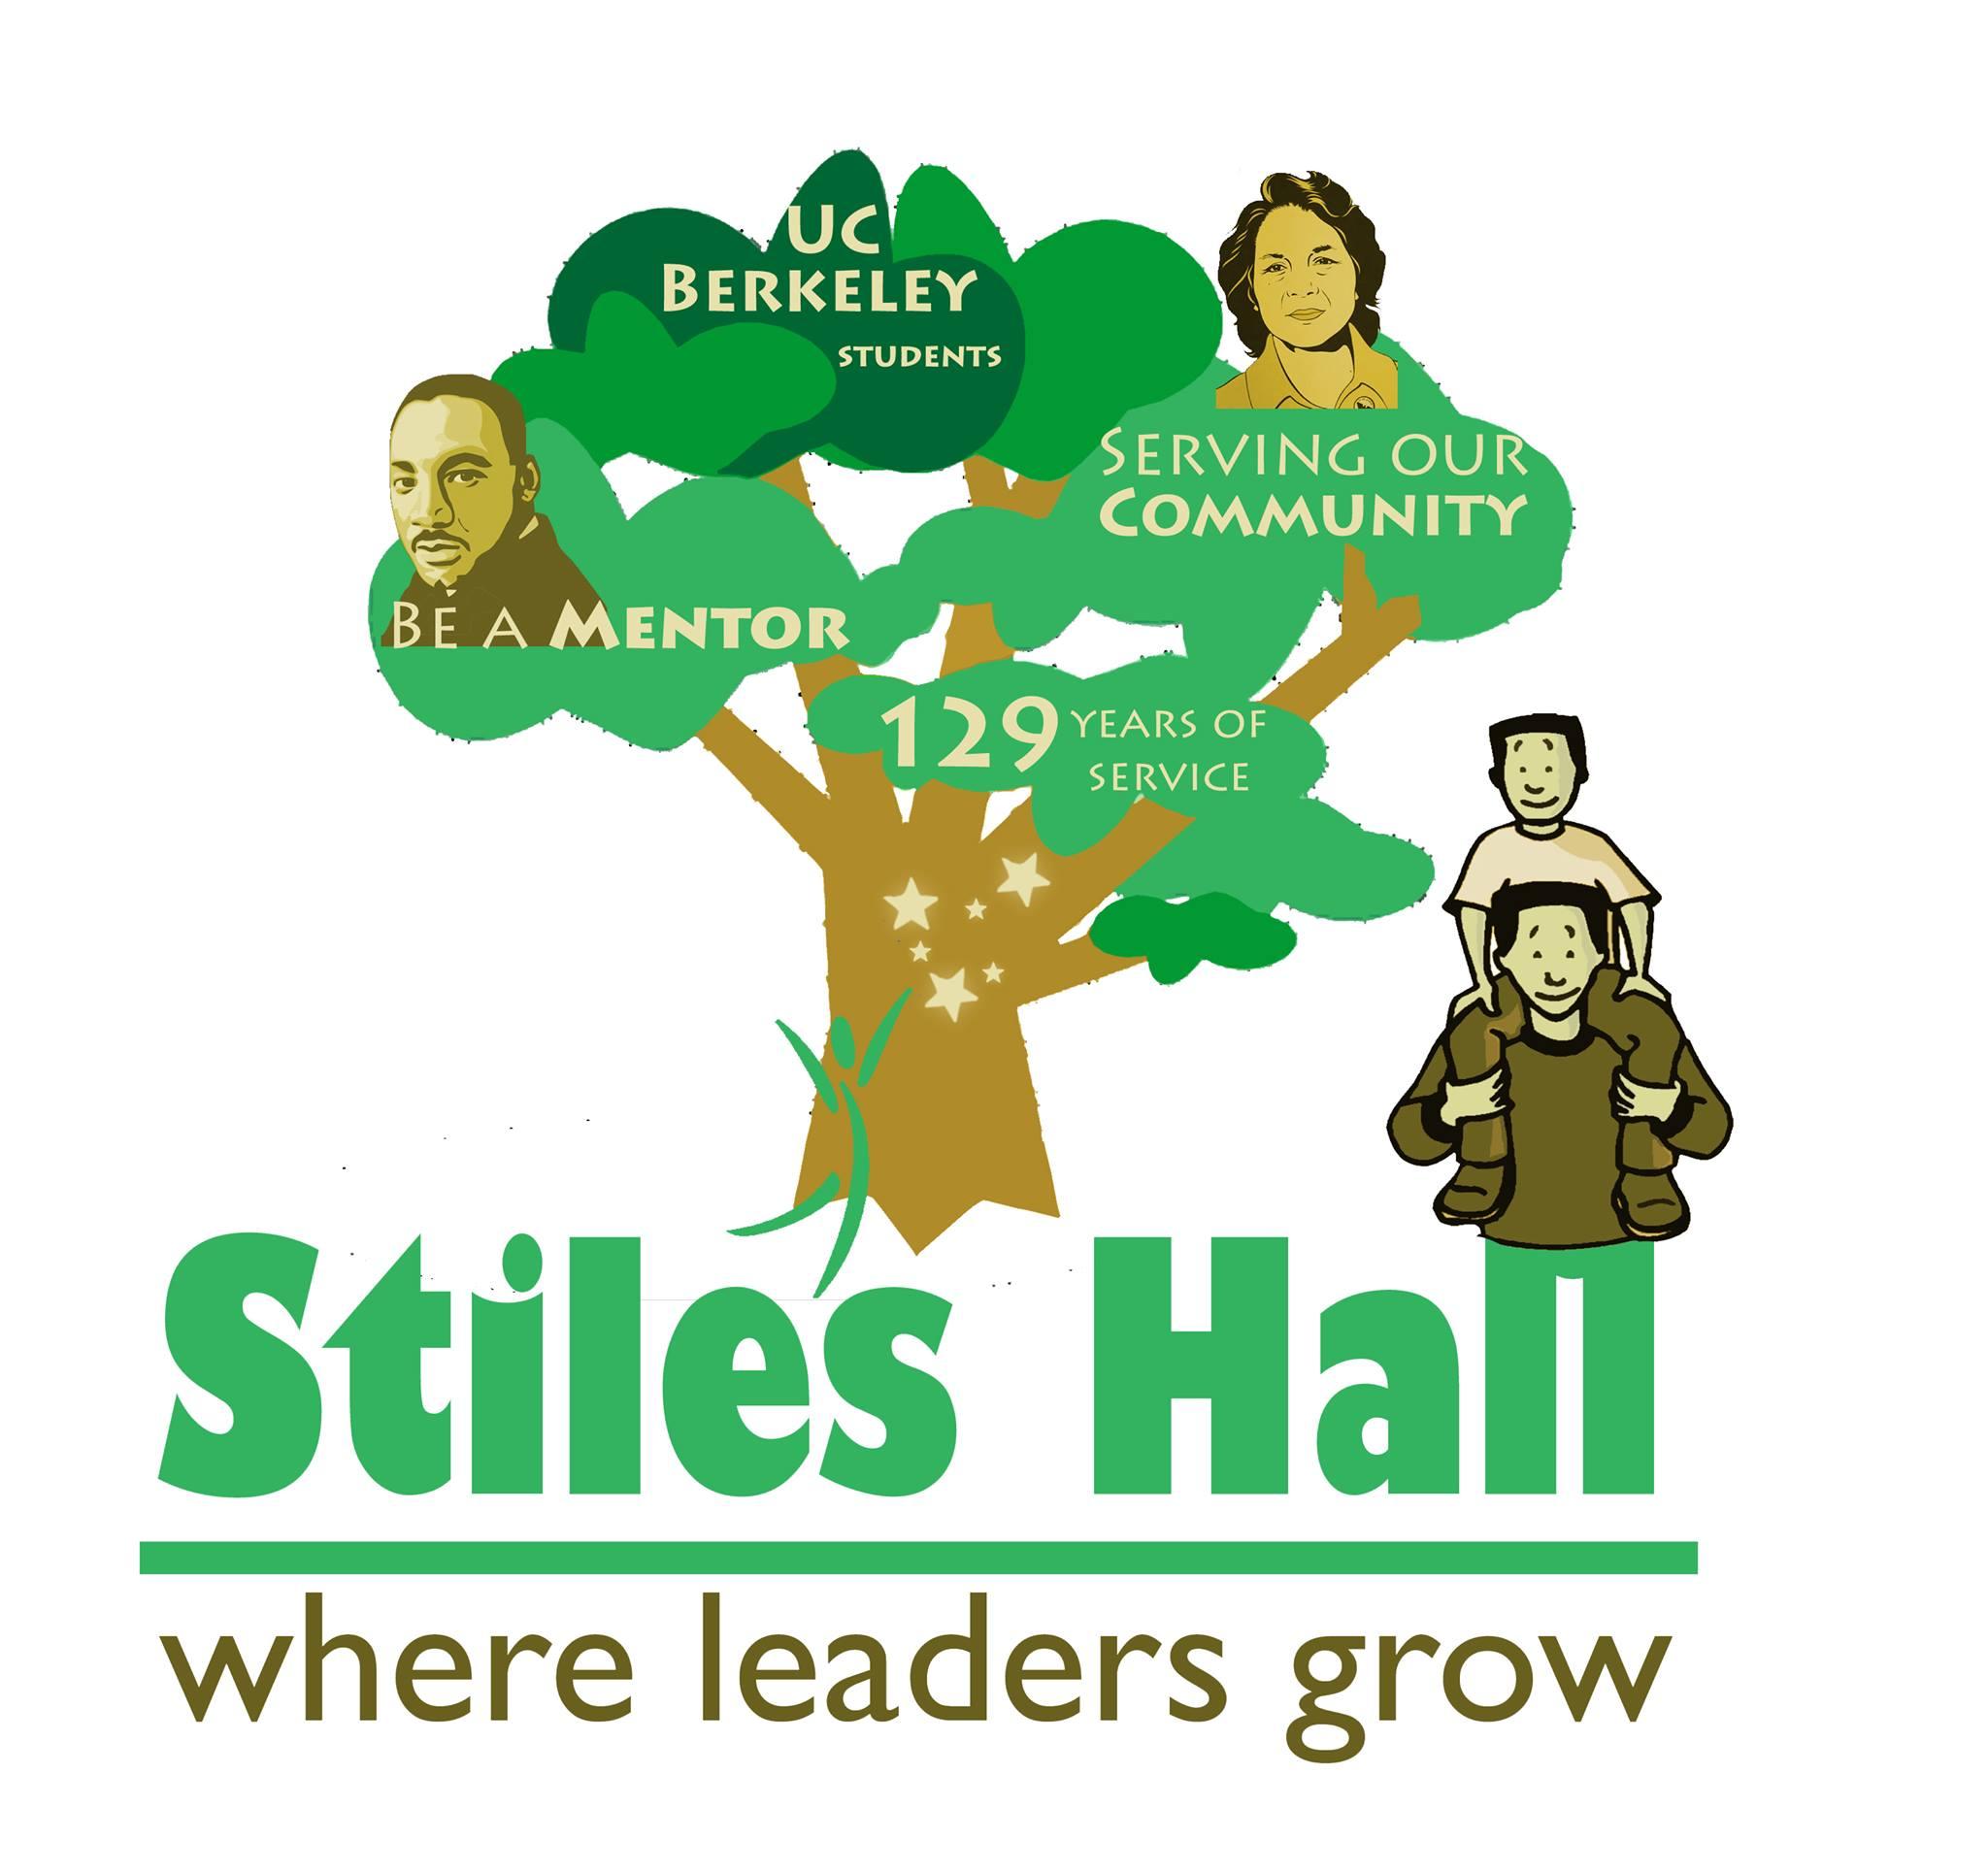 Workshop Facilitator - Berkeley Scholars to Cal at Stiles Hall